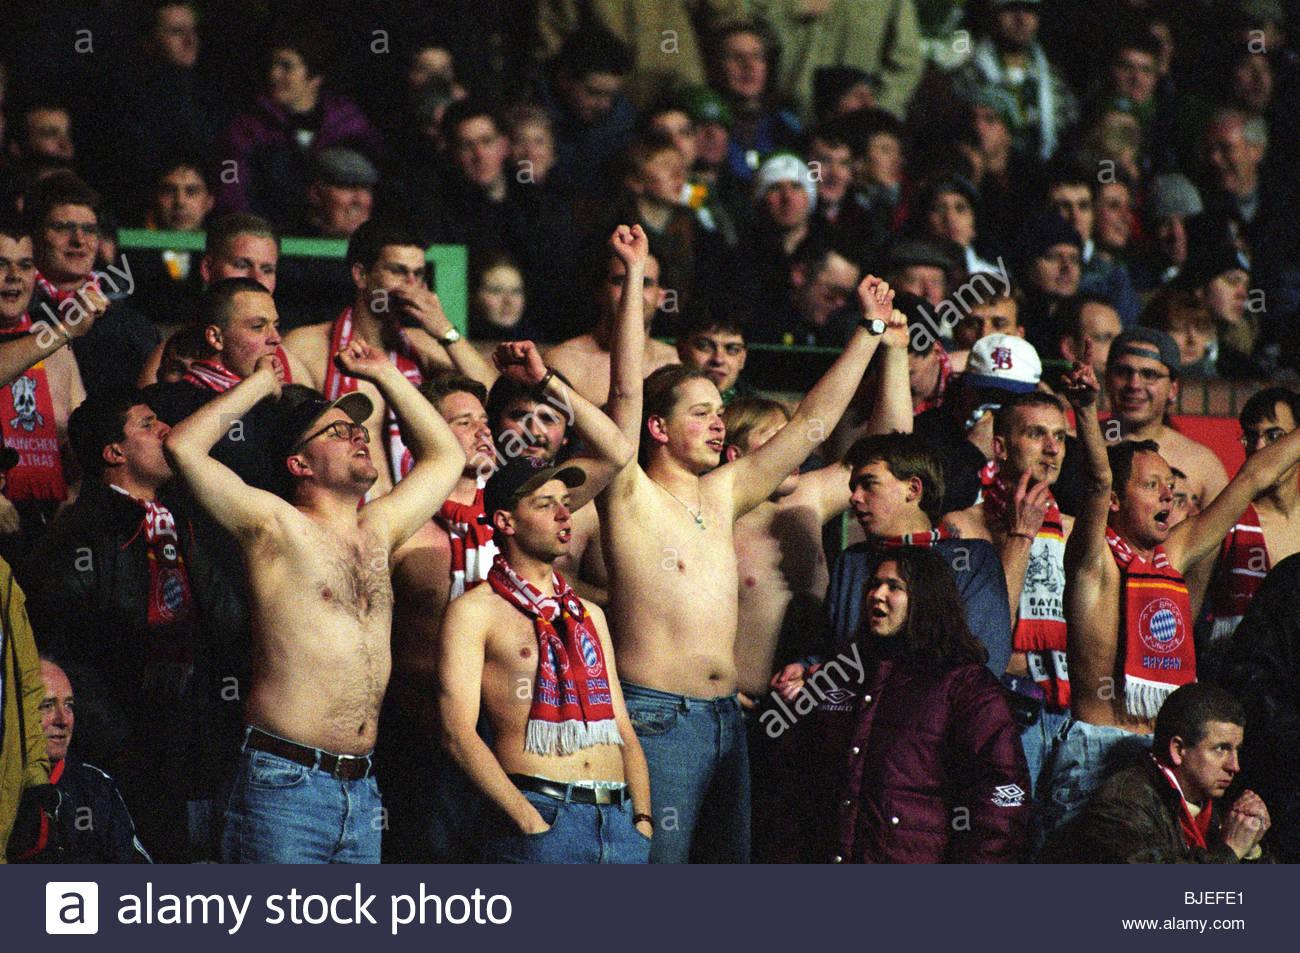 JANUARY 1997 PETER GRANT TESTIMONIAL CELTIC V BAYERN MUNICH (1-2) CELTIC PARK - GLASGOW Bayern Munich fans. - Stock Image